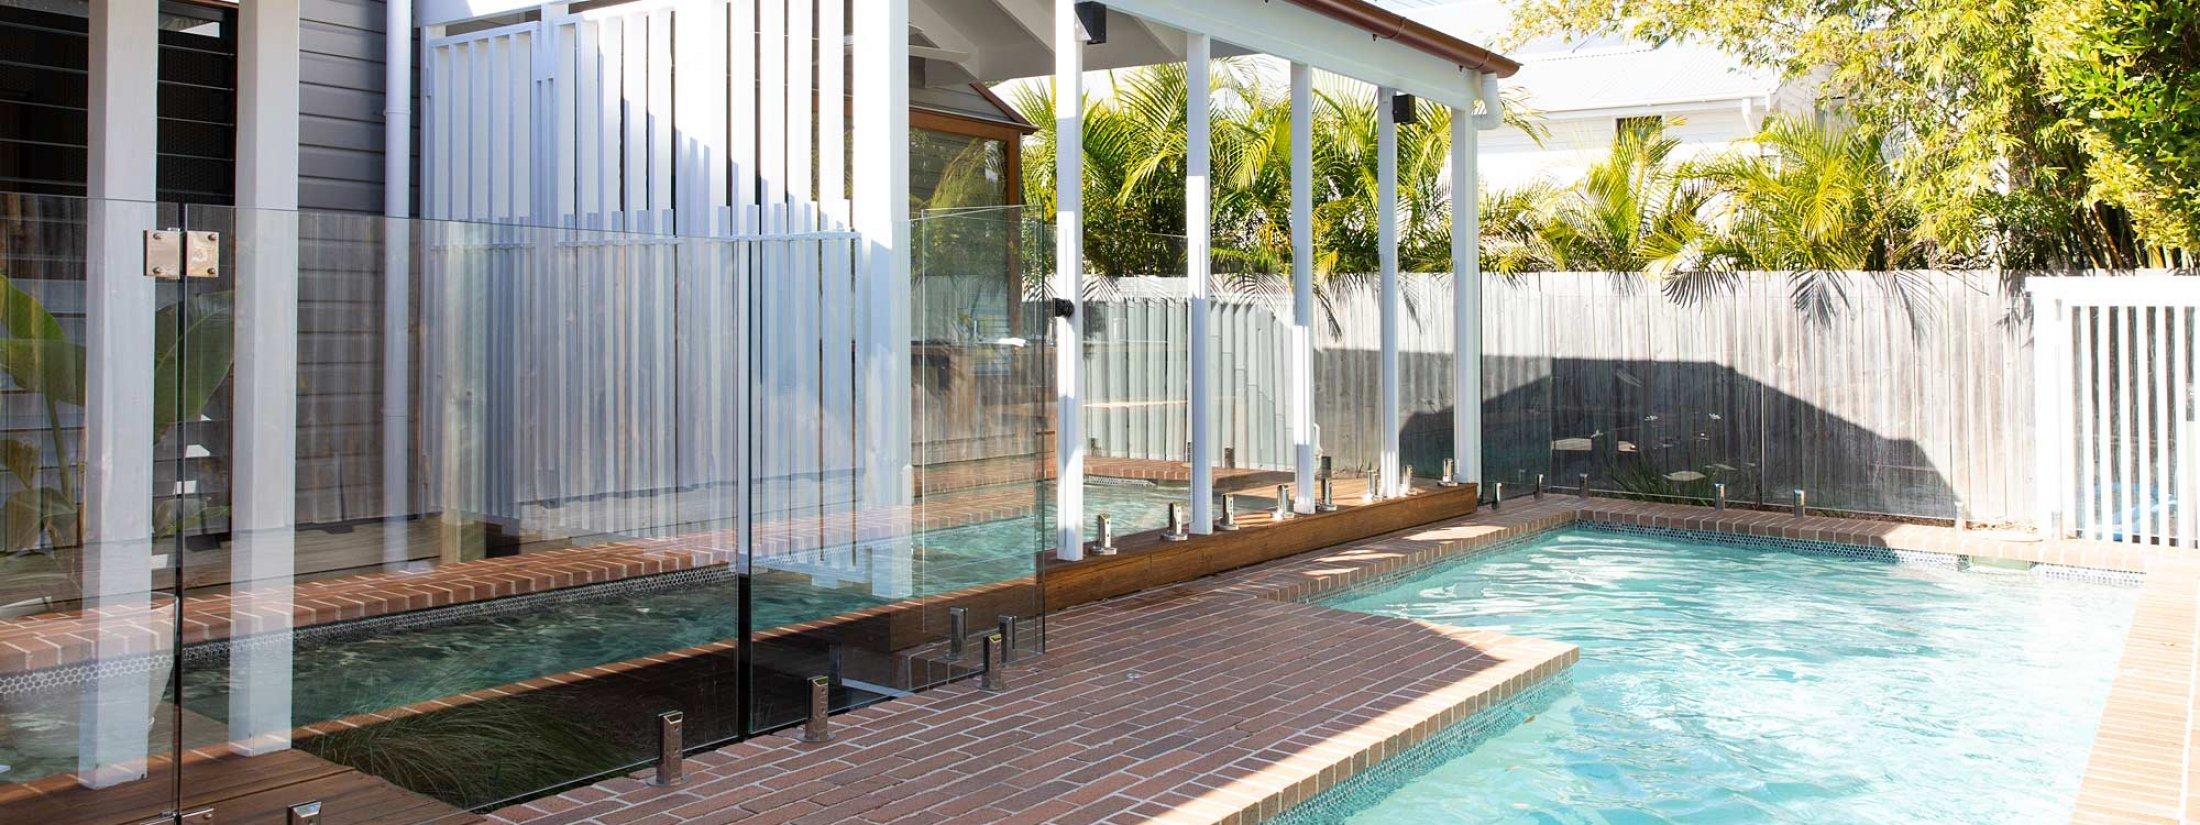 Bacchus - Byron Bay - Pool Toward House